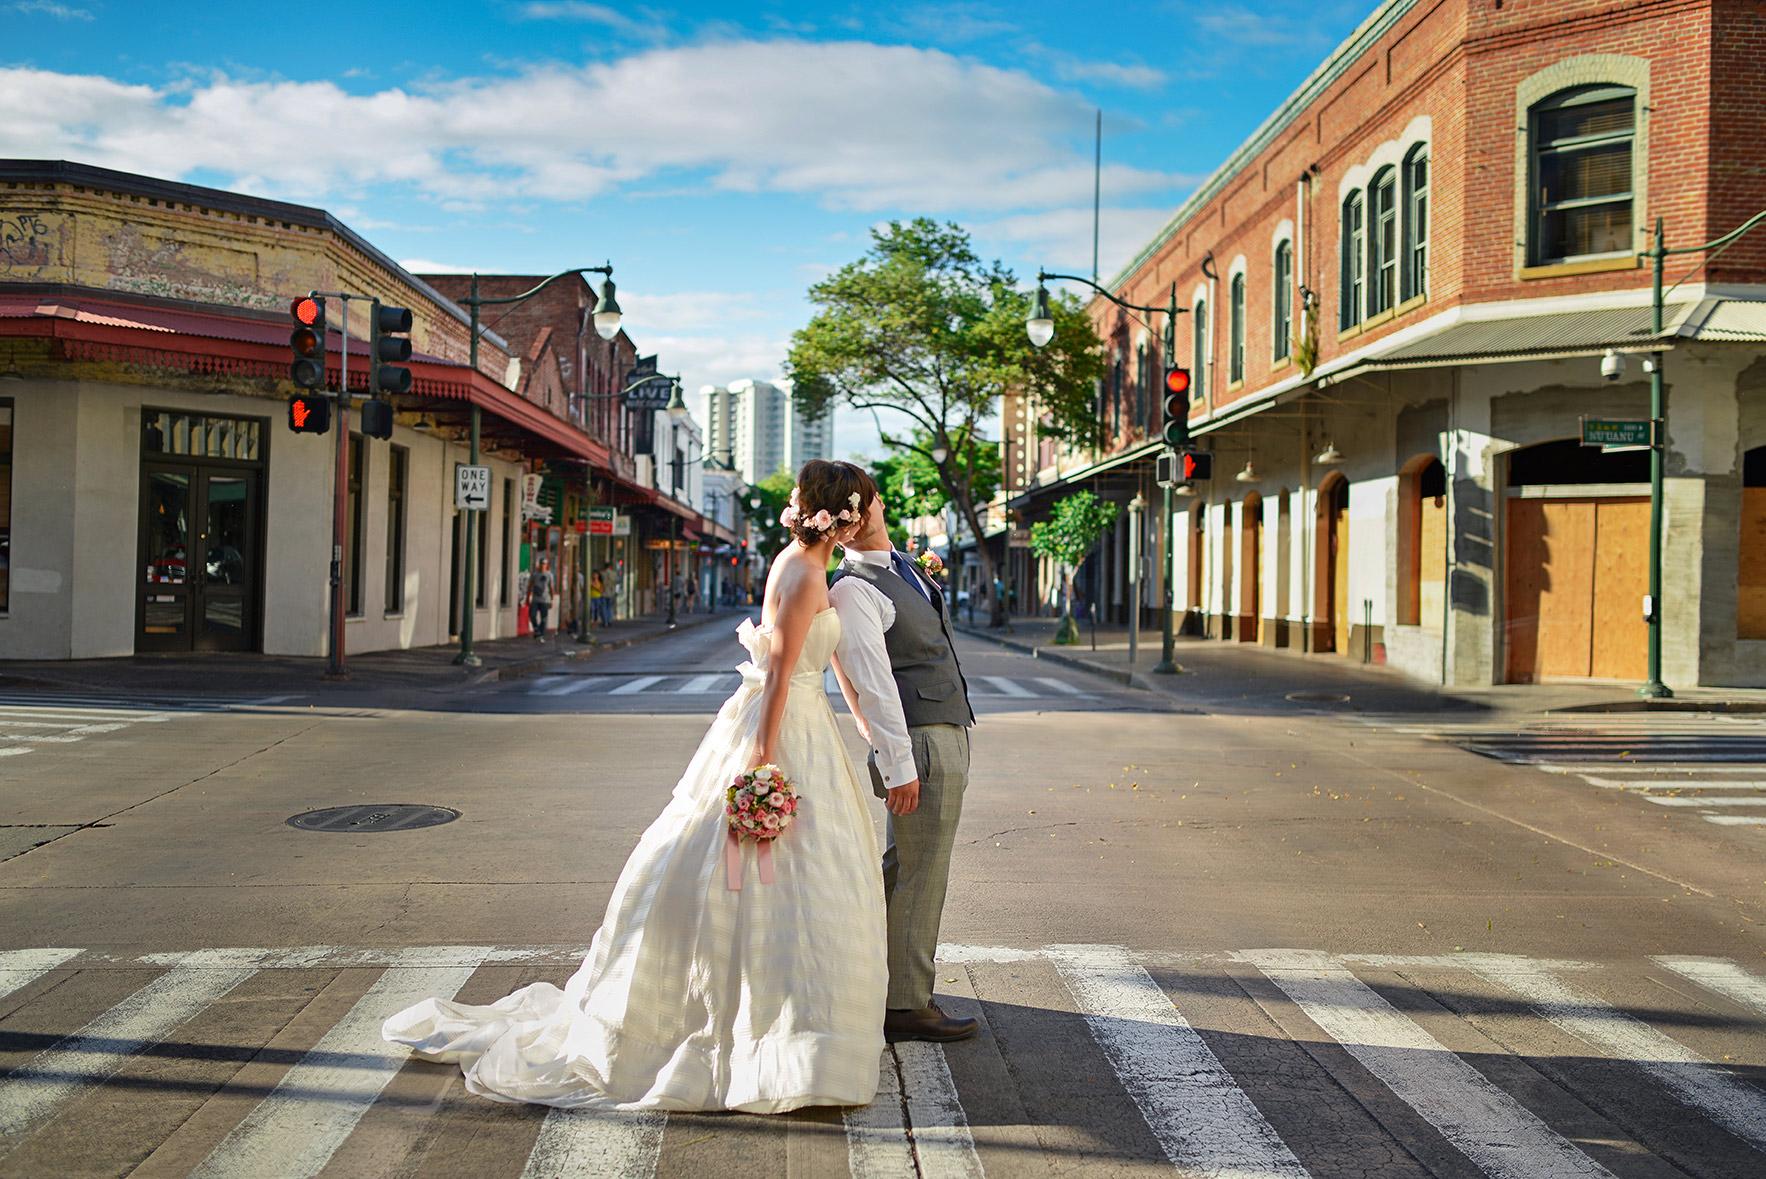 waikiki-beach-wedding-and-downtown-honolulu-hawaii-theater-stephen-ludwig-photography140.jpg